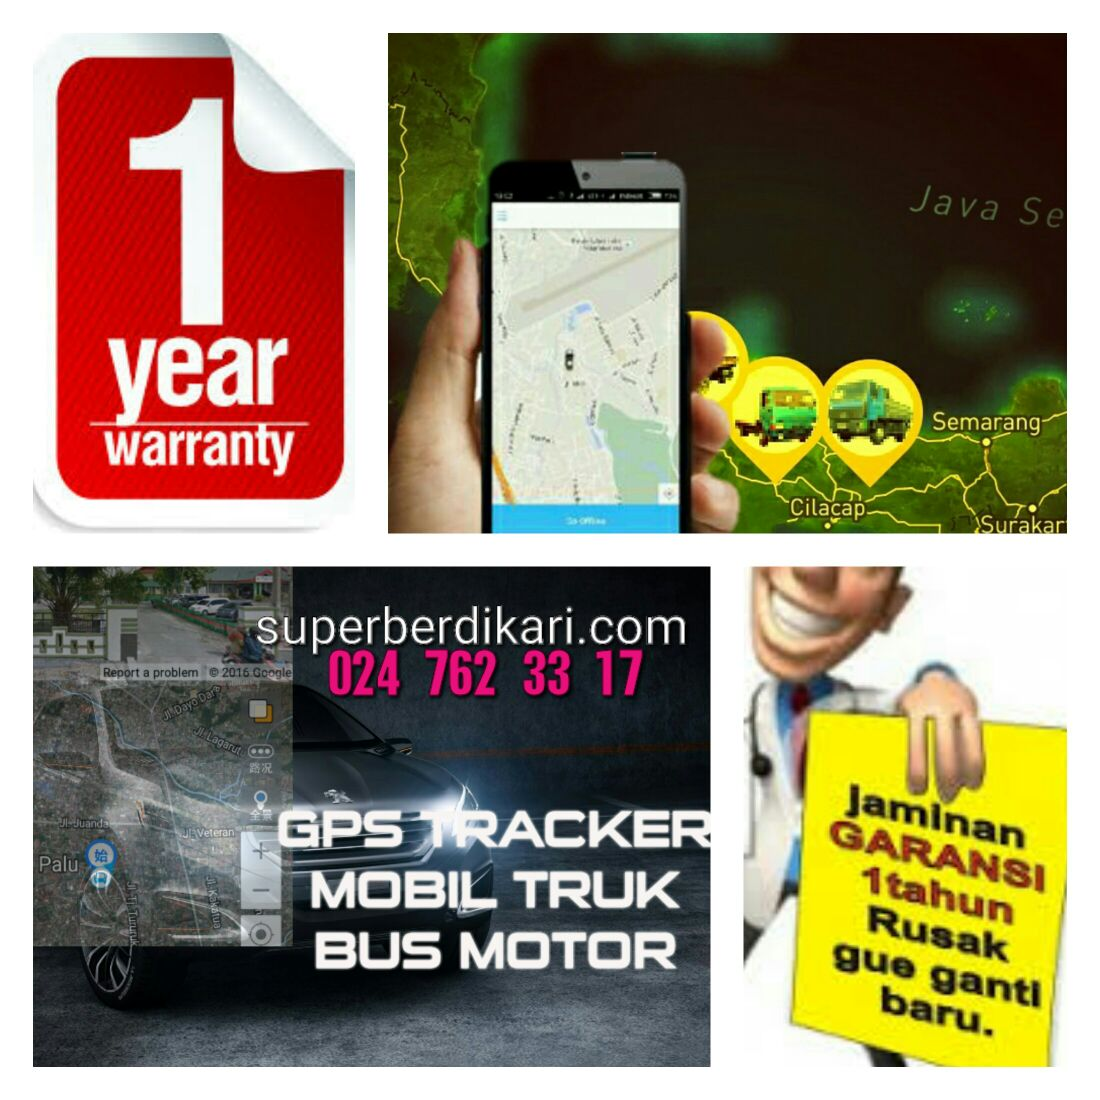 GPS TRACKER SEJAK 2009